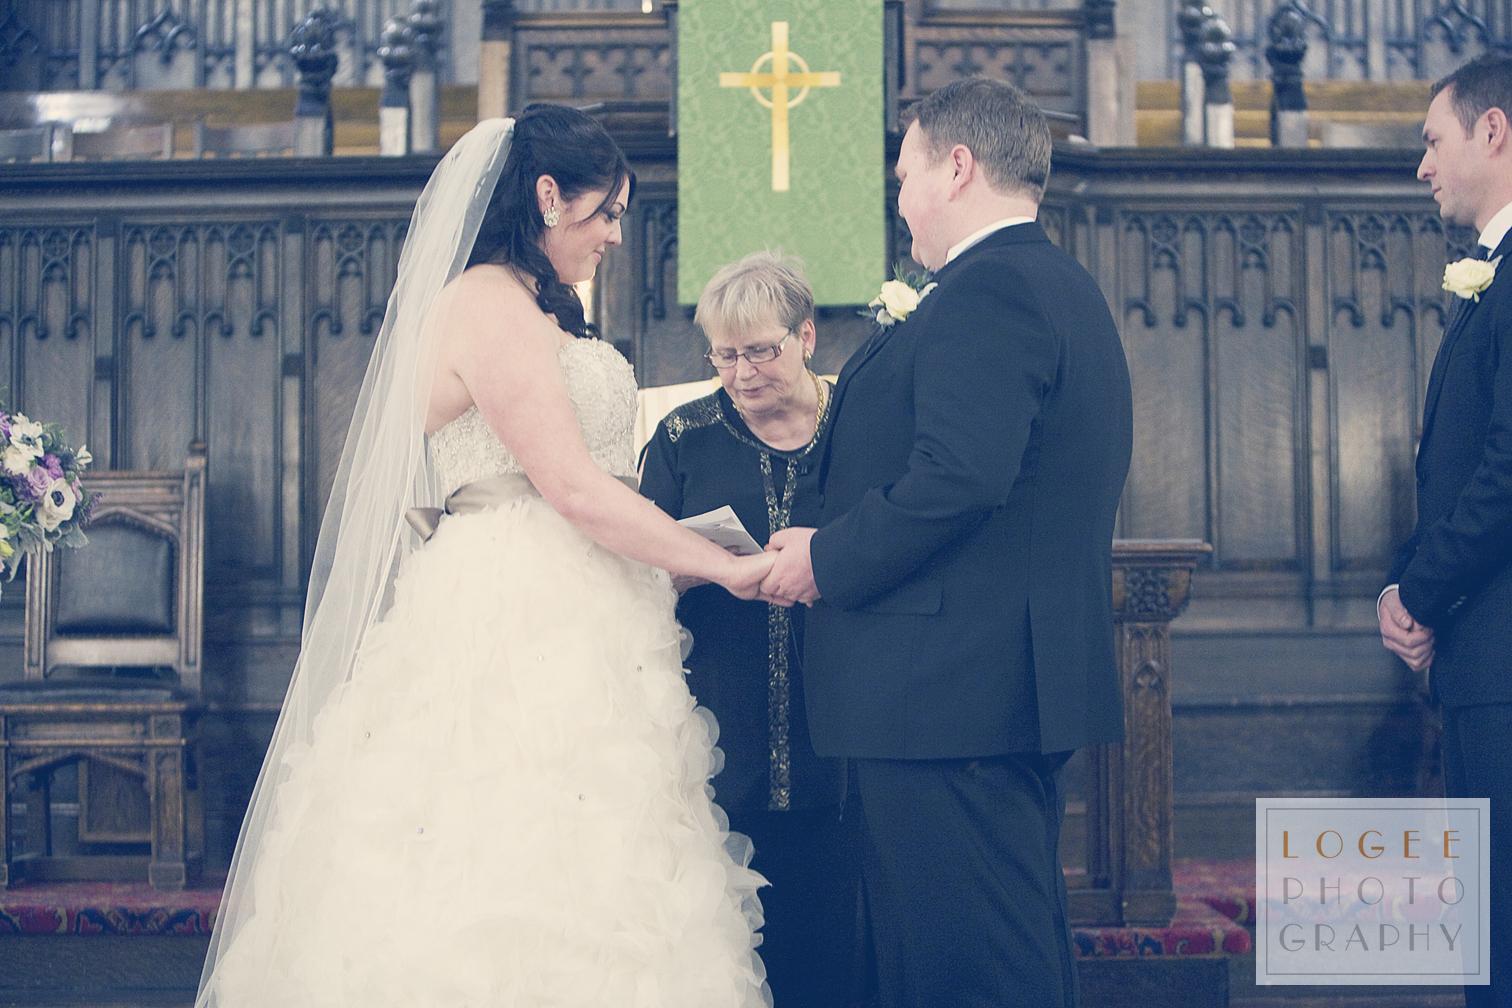 McIntosh-Burns Wedding - 6731-7671Cw